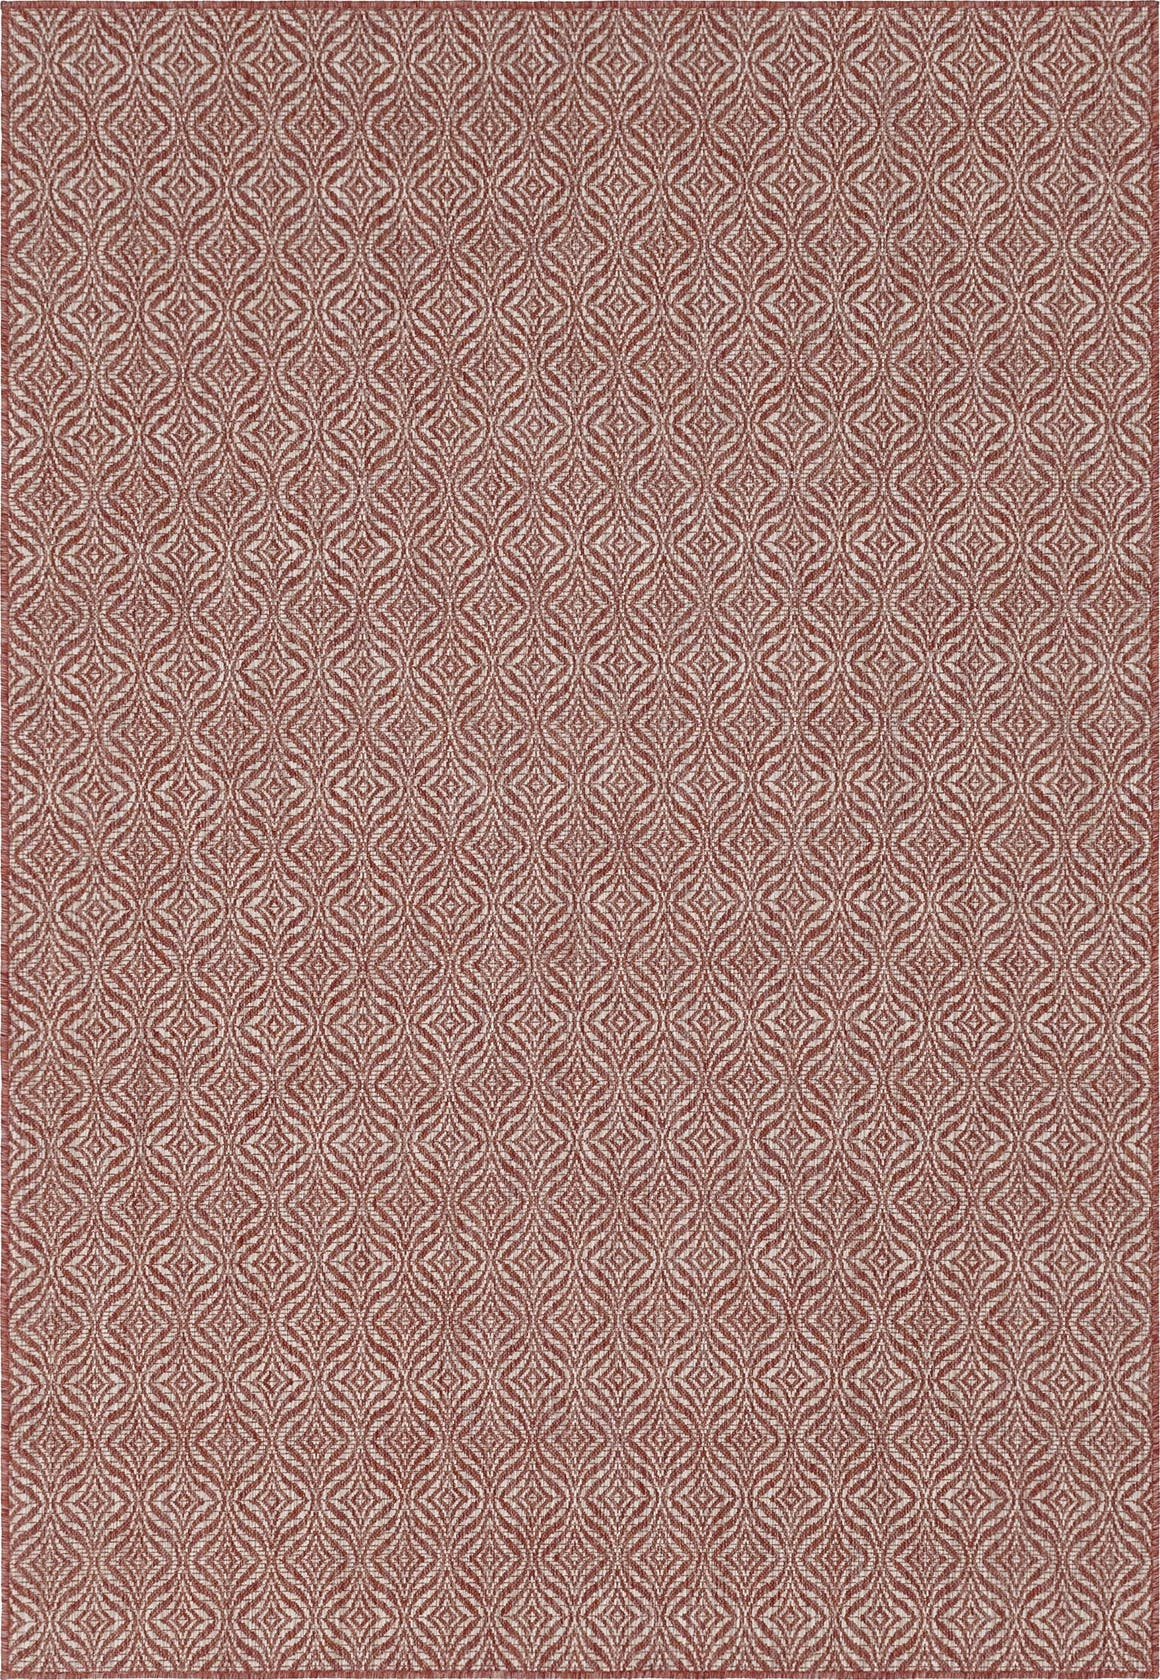 6' x 9' Outdoor Trellis Rug main image